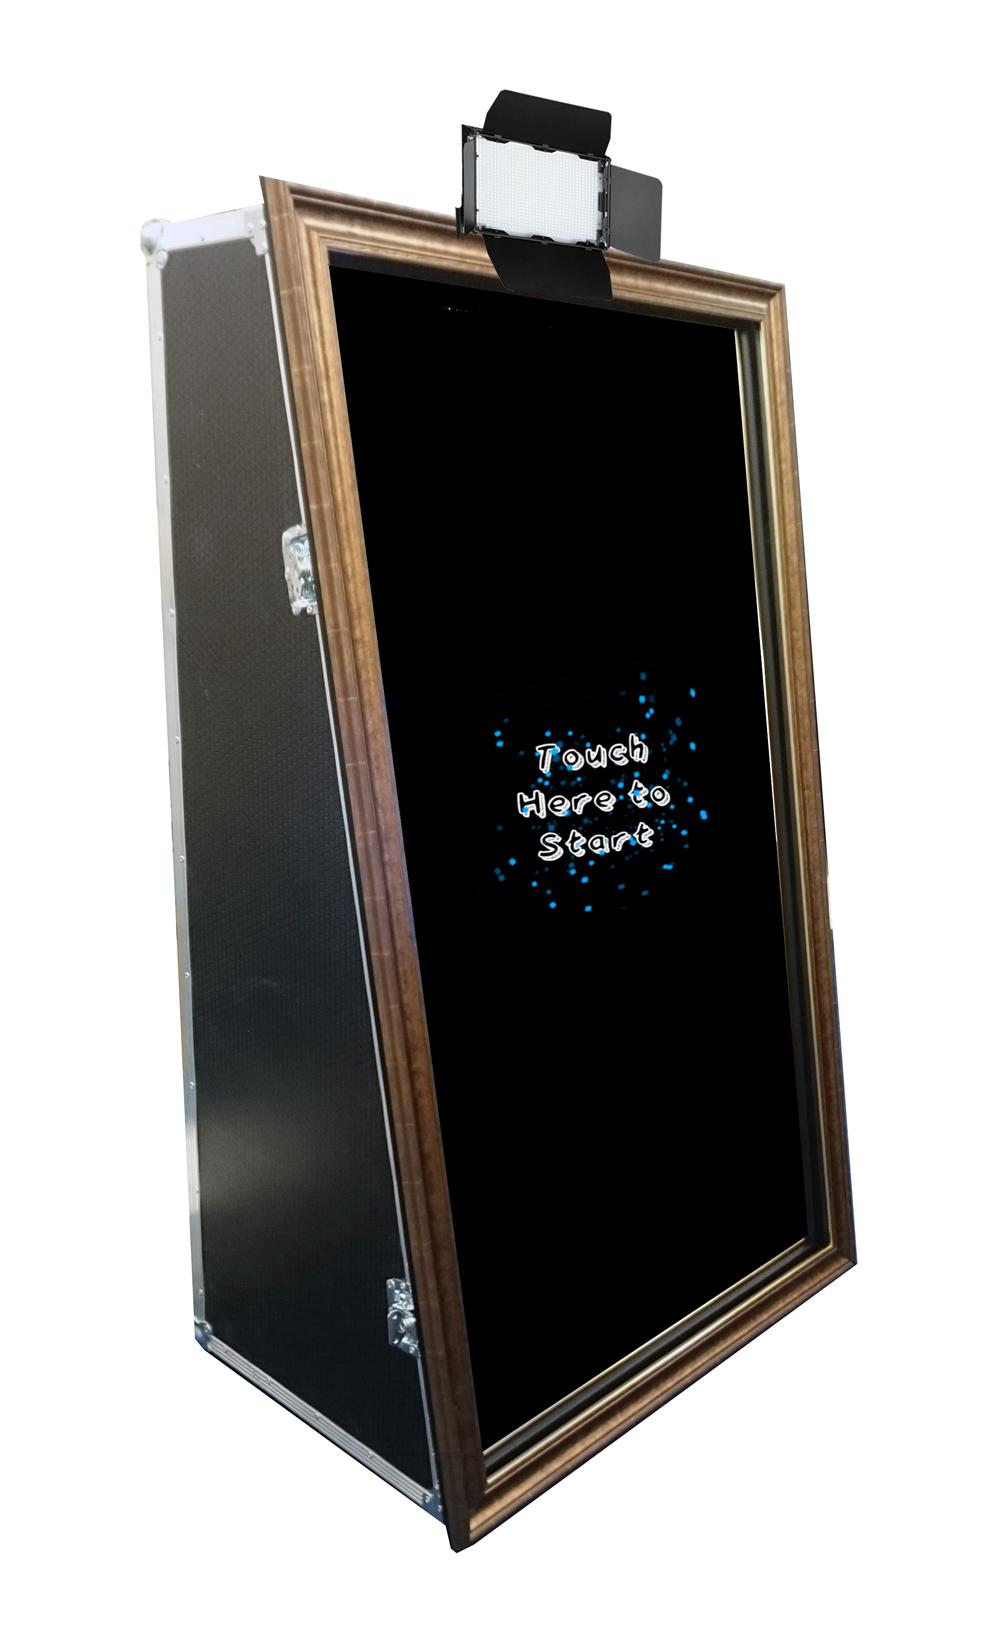 Photobooth Software Magic Photo Mirror